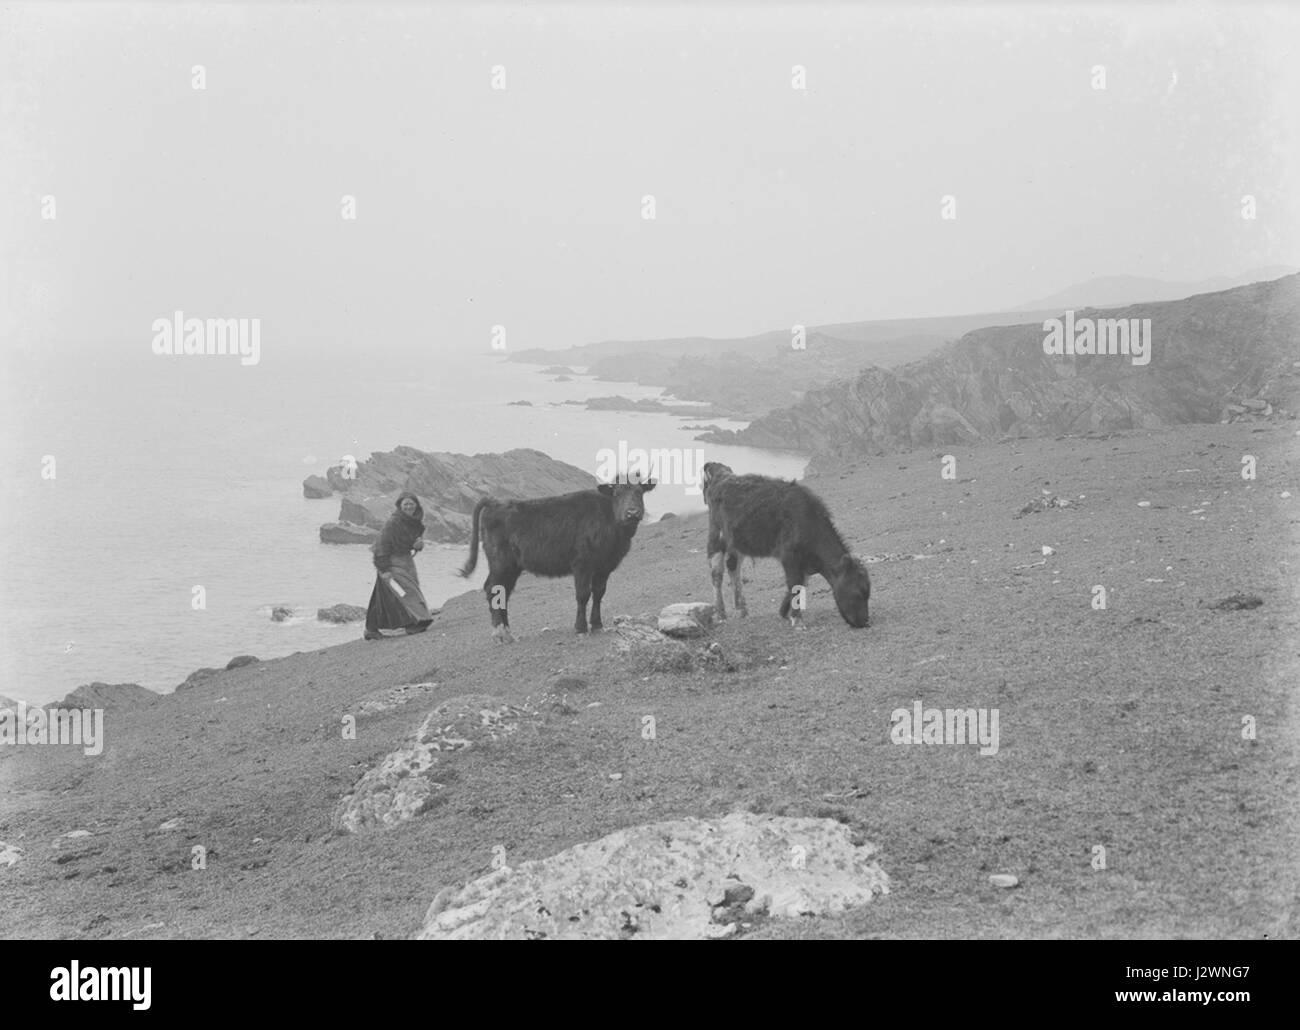 Achill Island (6266263777) - Stock Image